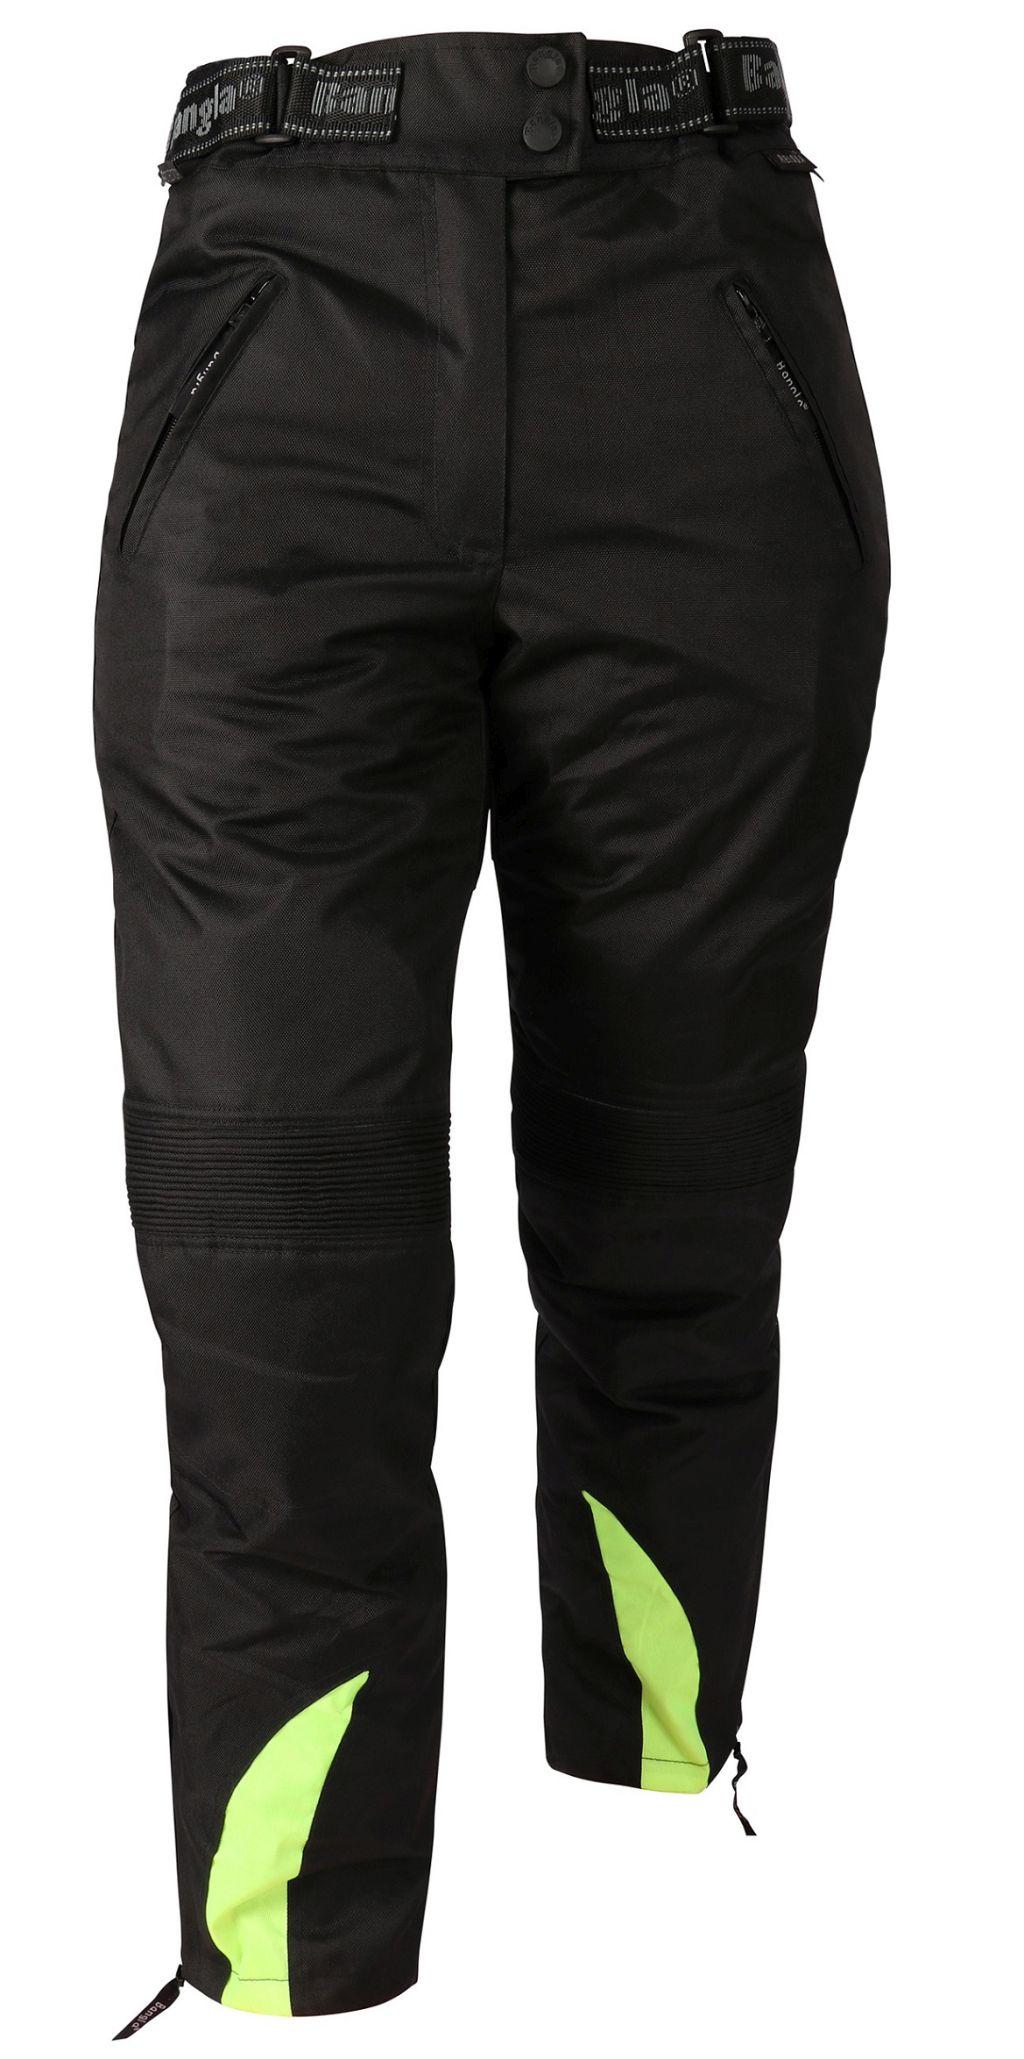 Bangla Damen Motorrad Cordura Textil Hose Schwarz Neon gelb S M L XL XXL XXXL